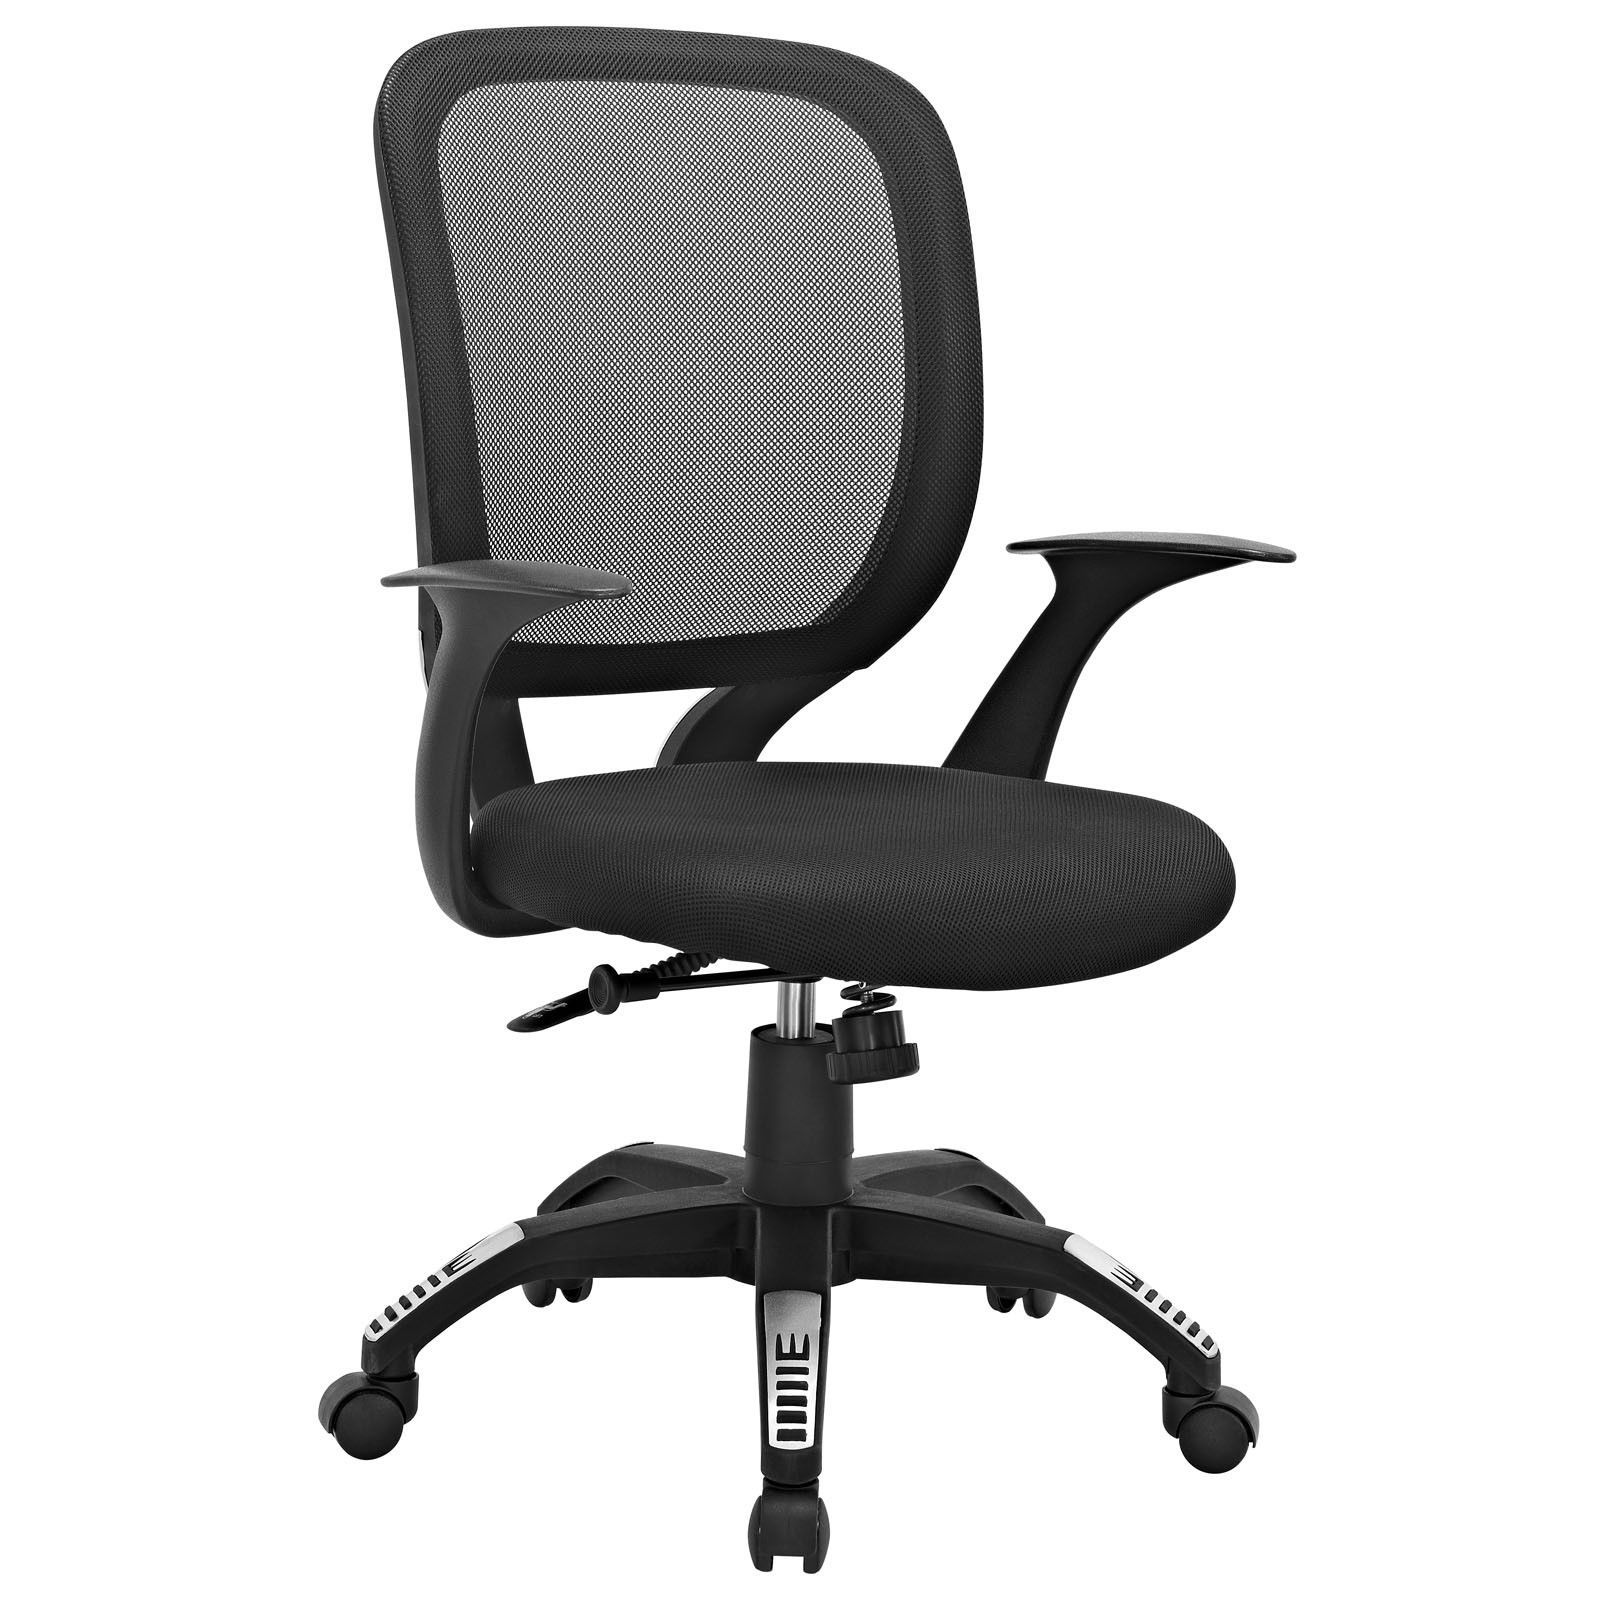 Scope Office Chair Black